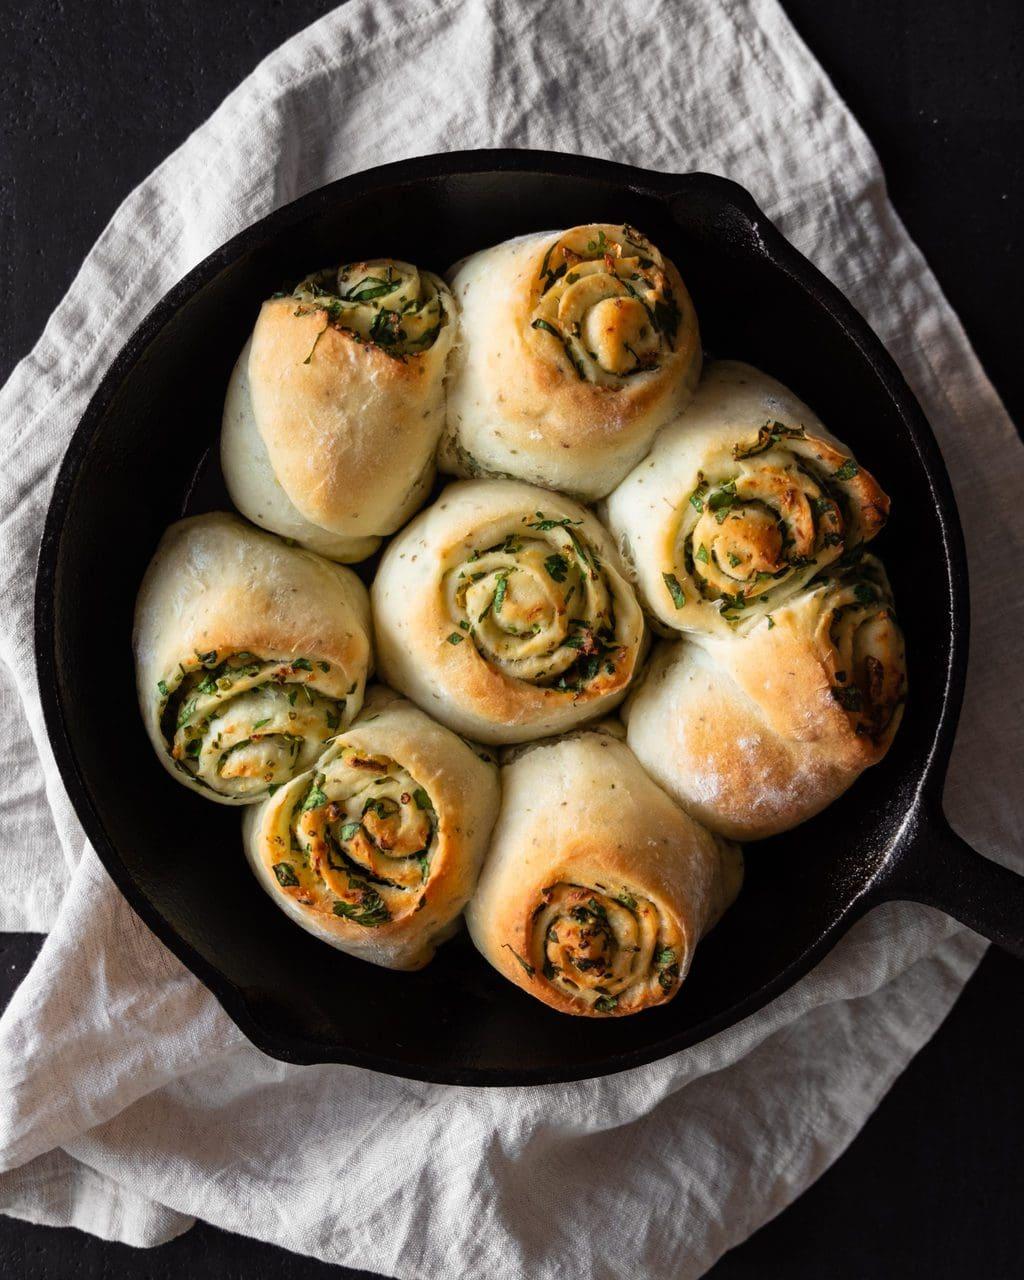 garlic bread scrolls from above